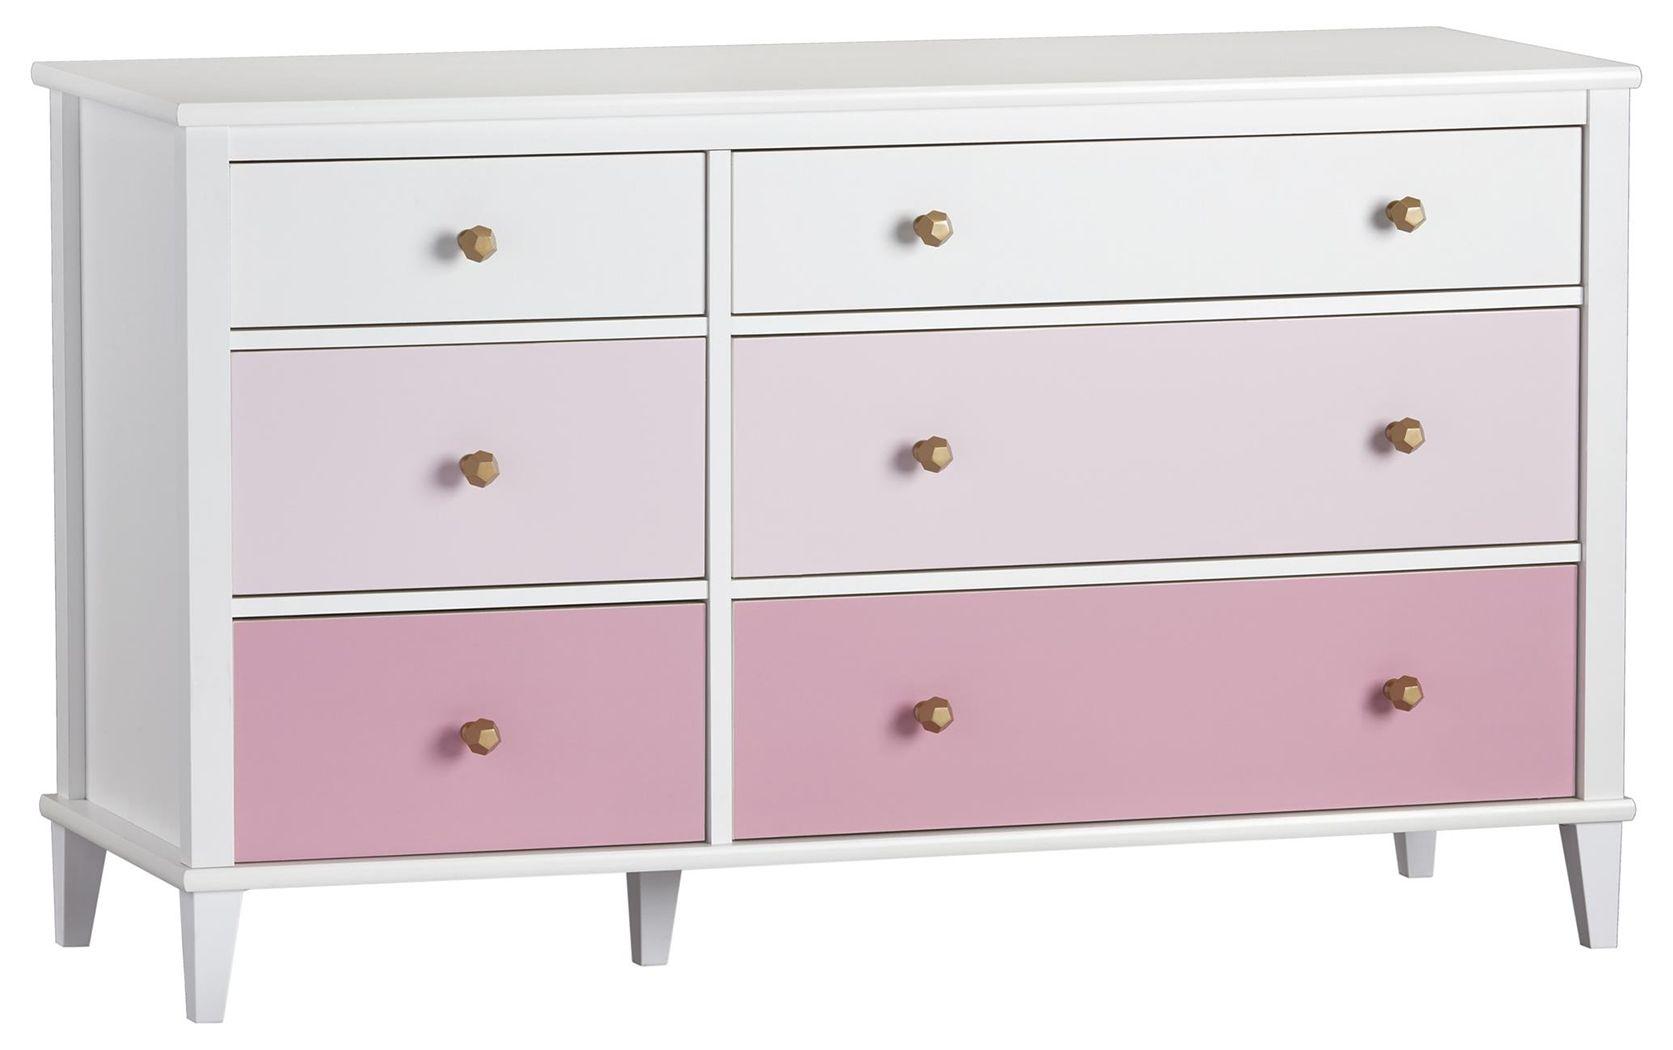 6 Drawer Dresser Pink Dresser Drawers 6 Drawer Dresser Shabby Chic Dresser [ 1050 x 1673 Pixel ]